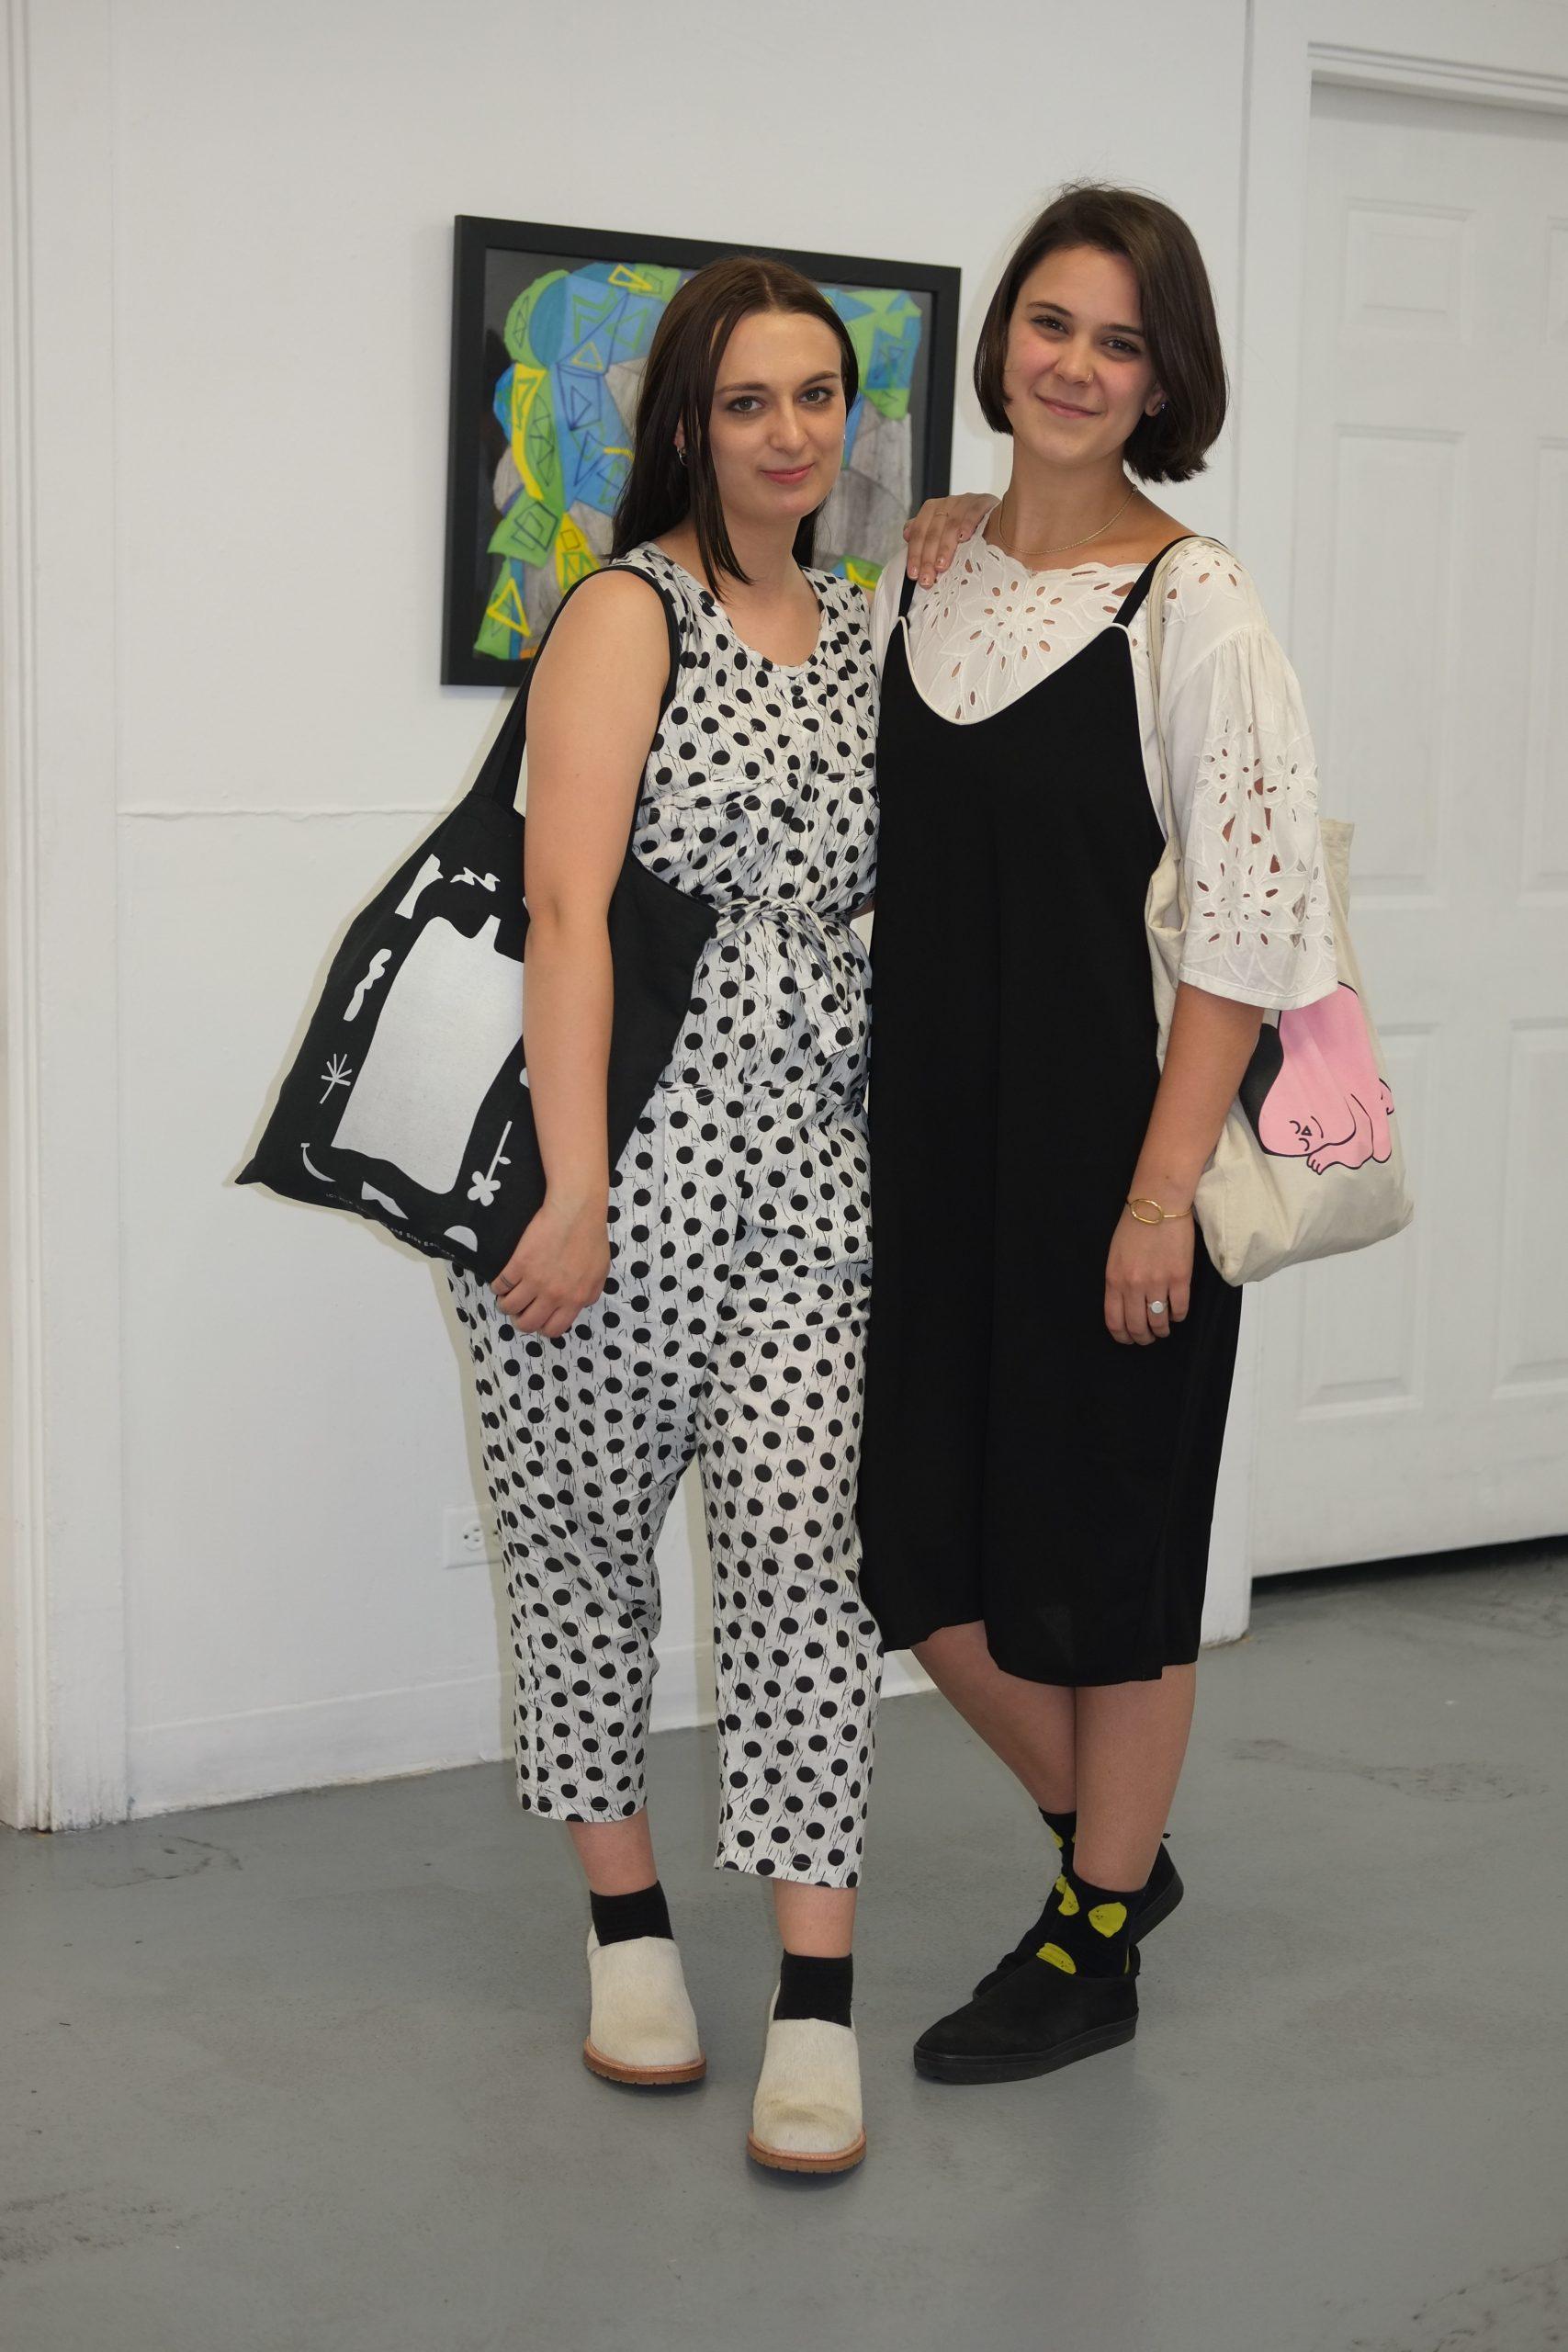 Natalyia and Heather